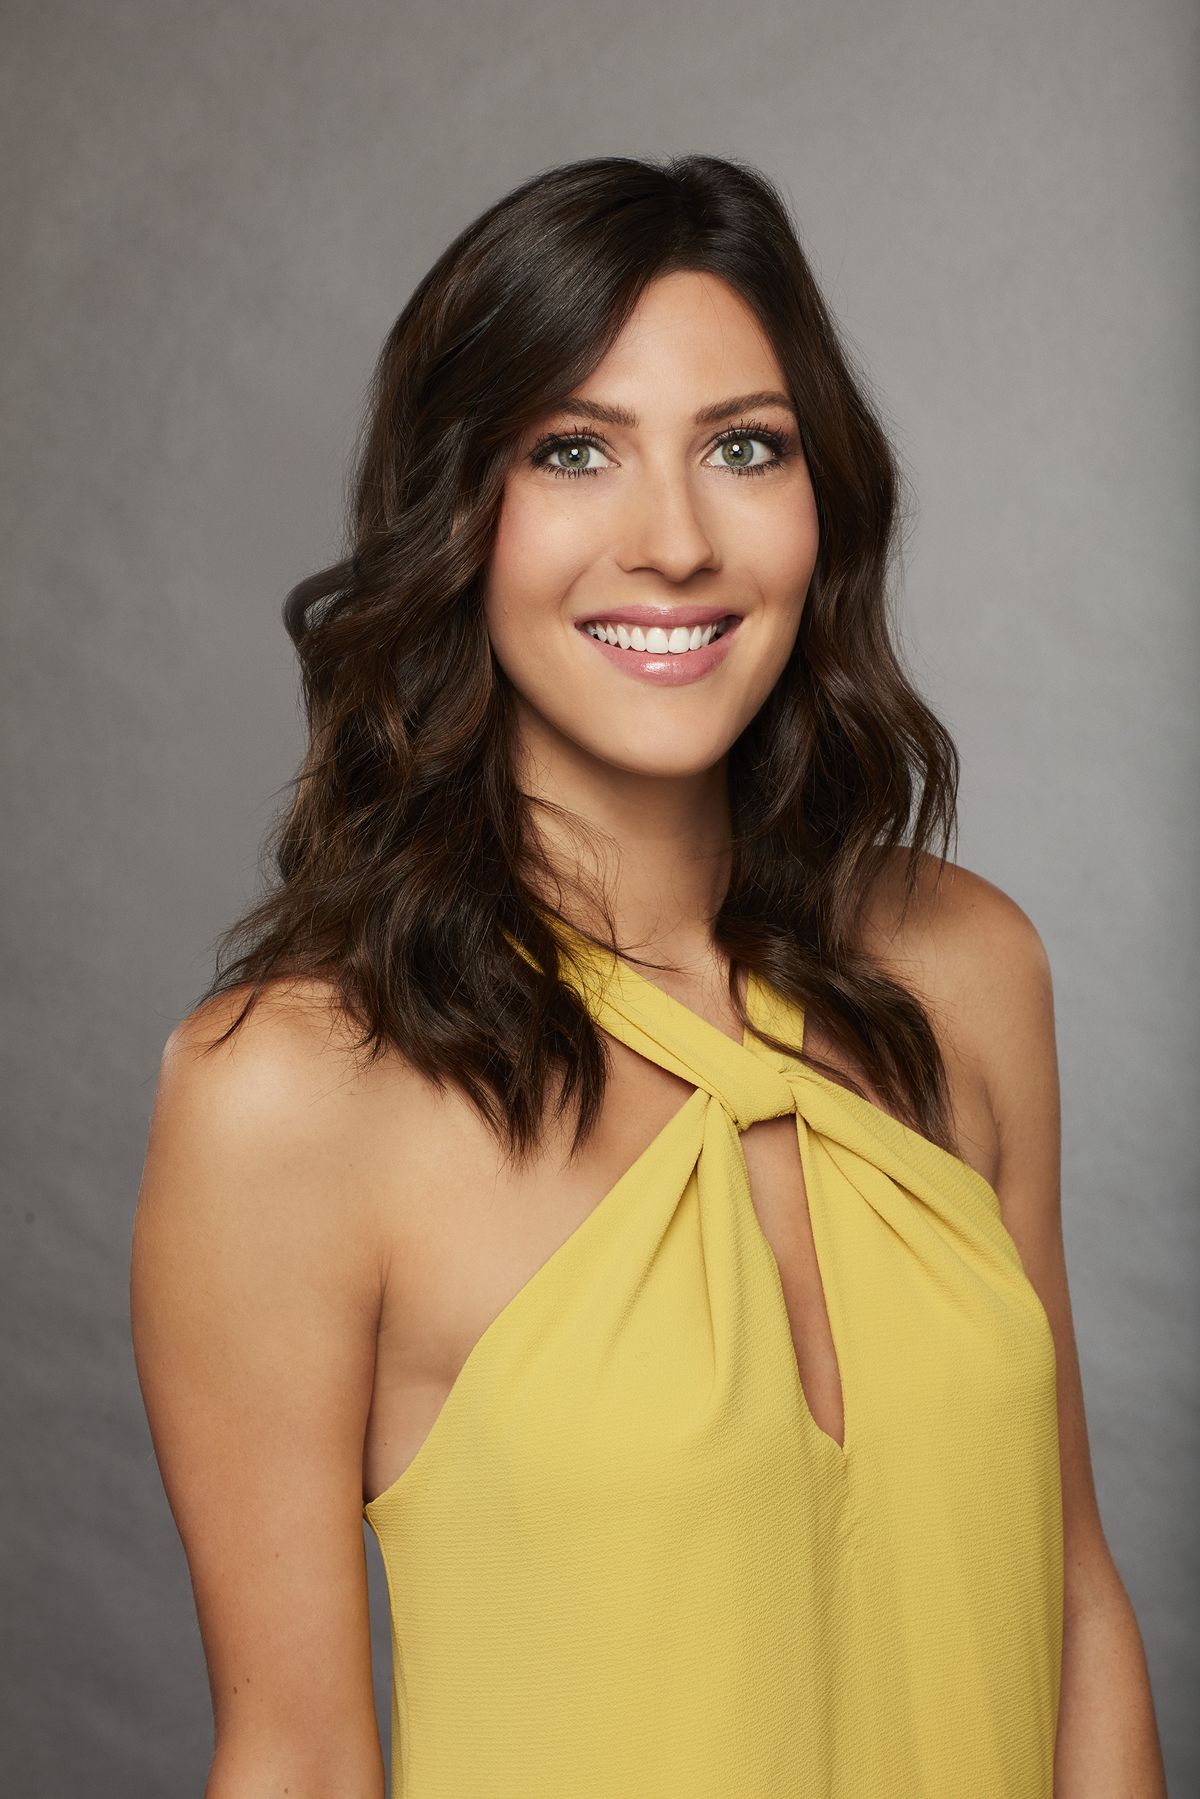 Bachelor contestant Becca, 26